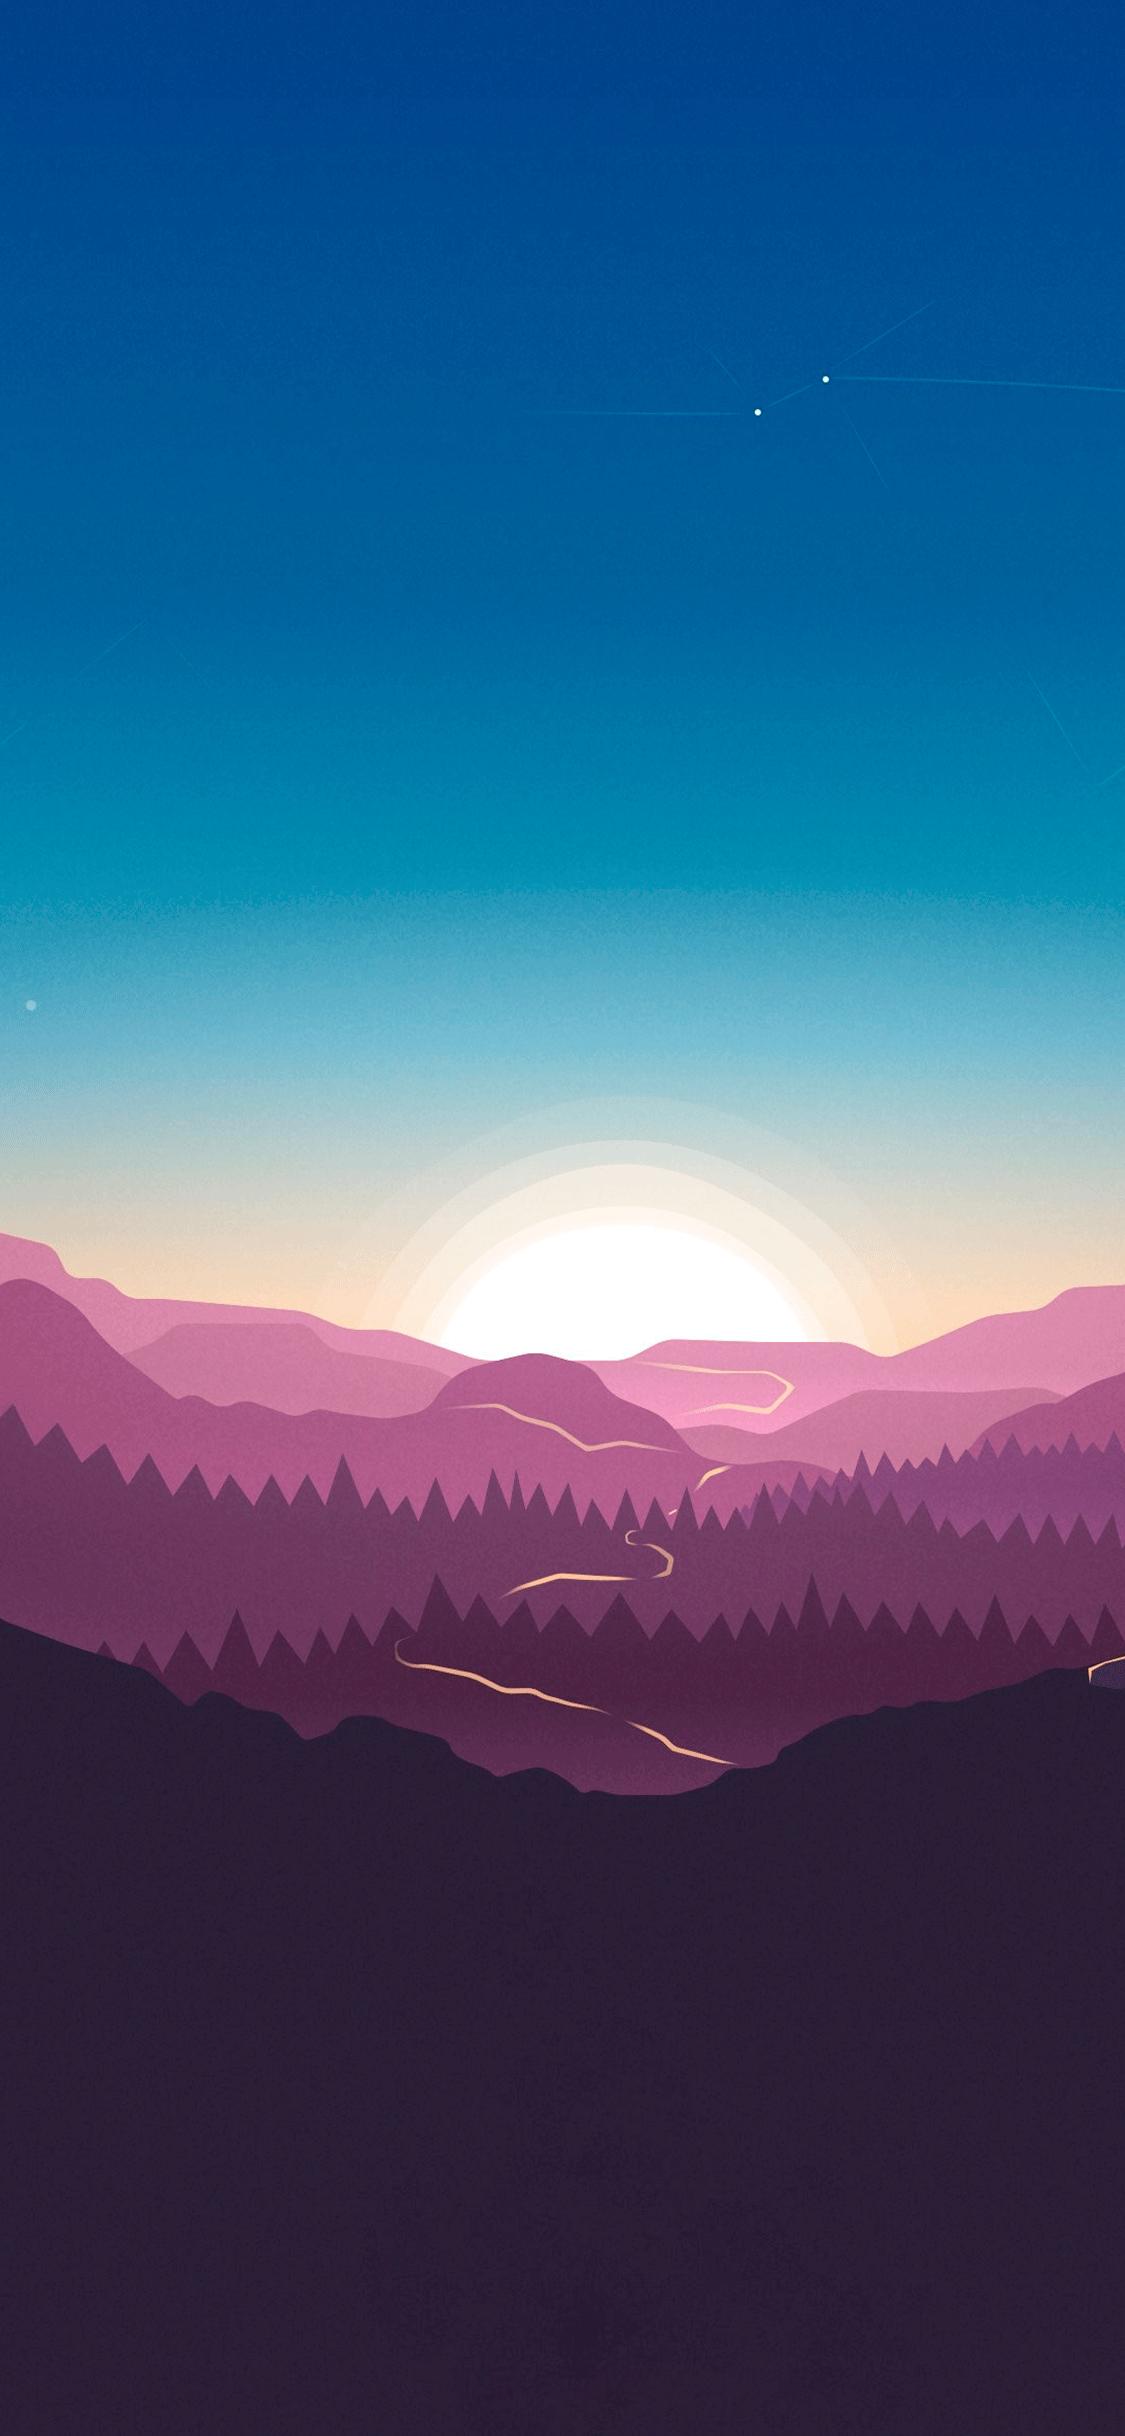 iPhone wallpaper illustration sunset Illustration